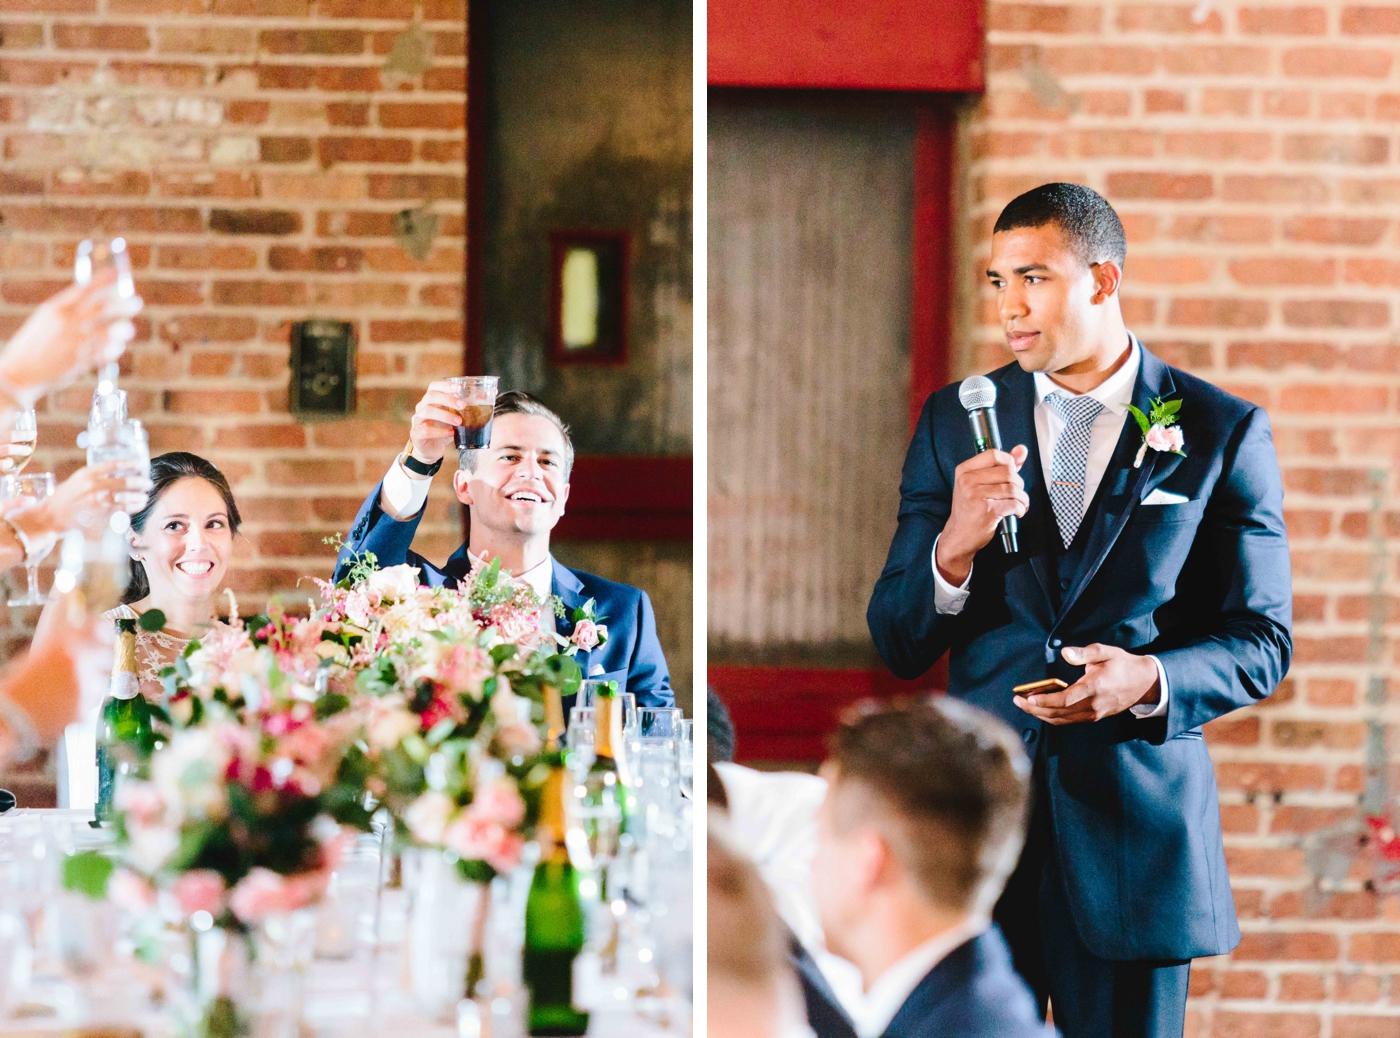 chicago-fine-art-wedding-photography-tyma55